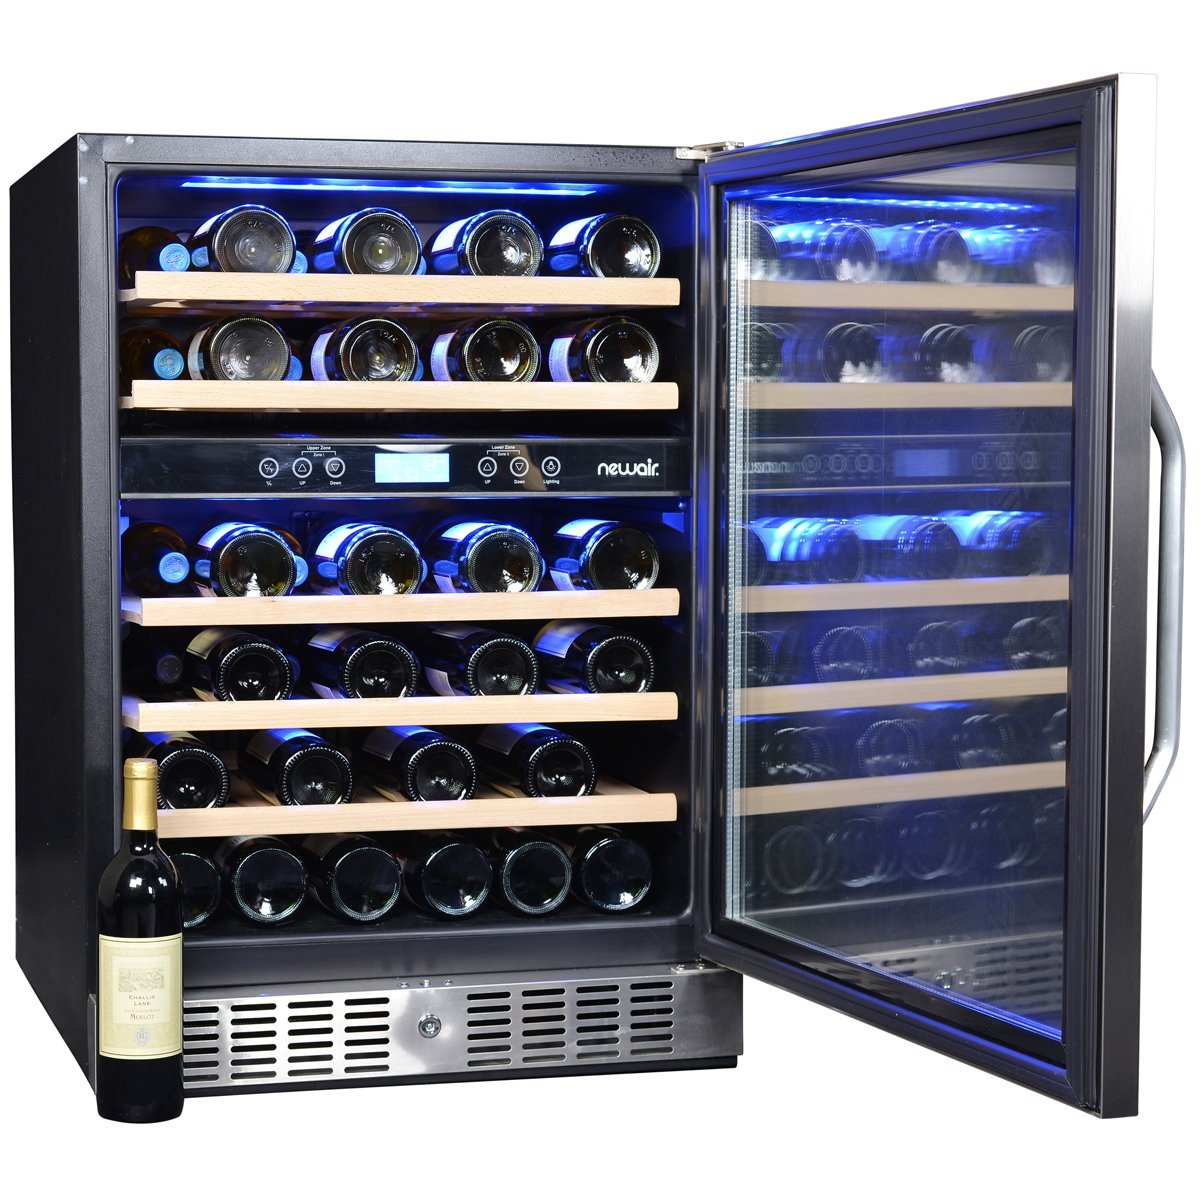 NewAir AWR-460DB Dual Zone Compressor Wine Cooler-46 Bottle